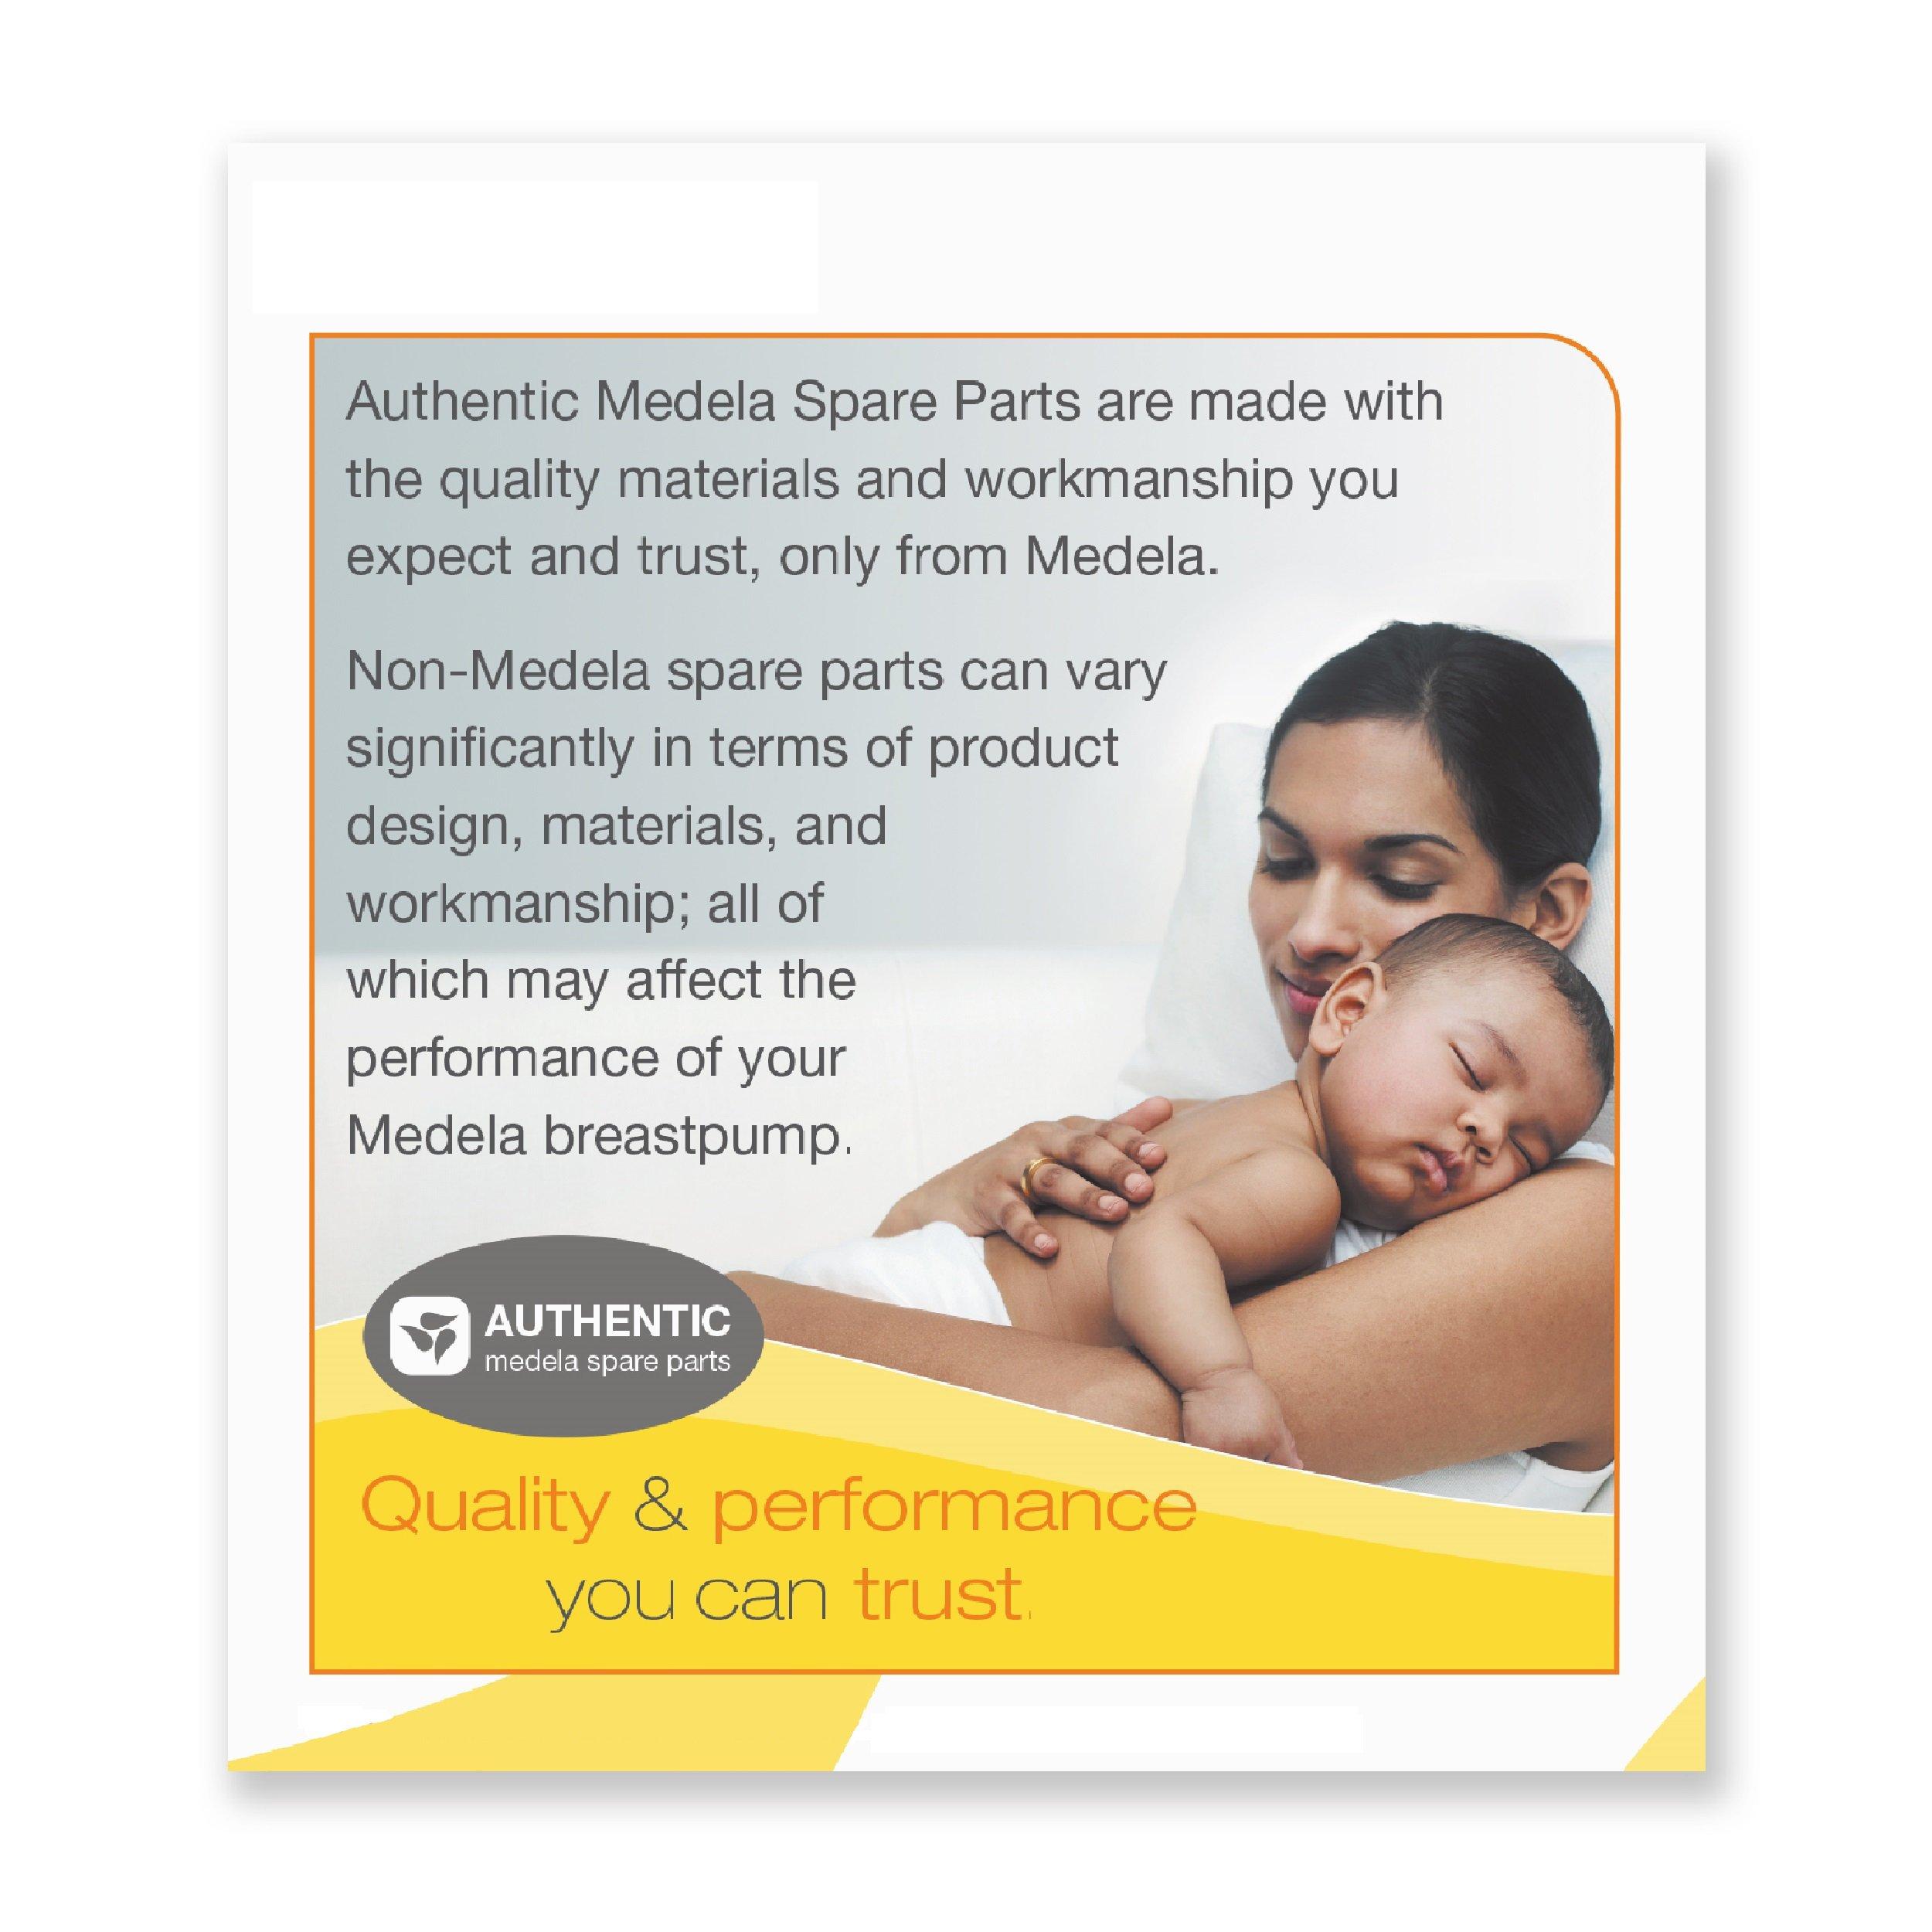 Medela PersonalFit Breast Shield, 21 mm by Medela (Image #3)